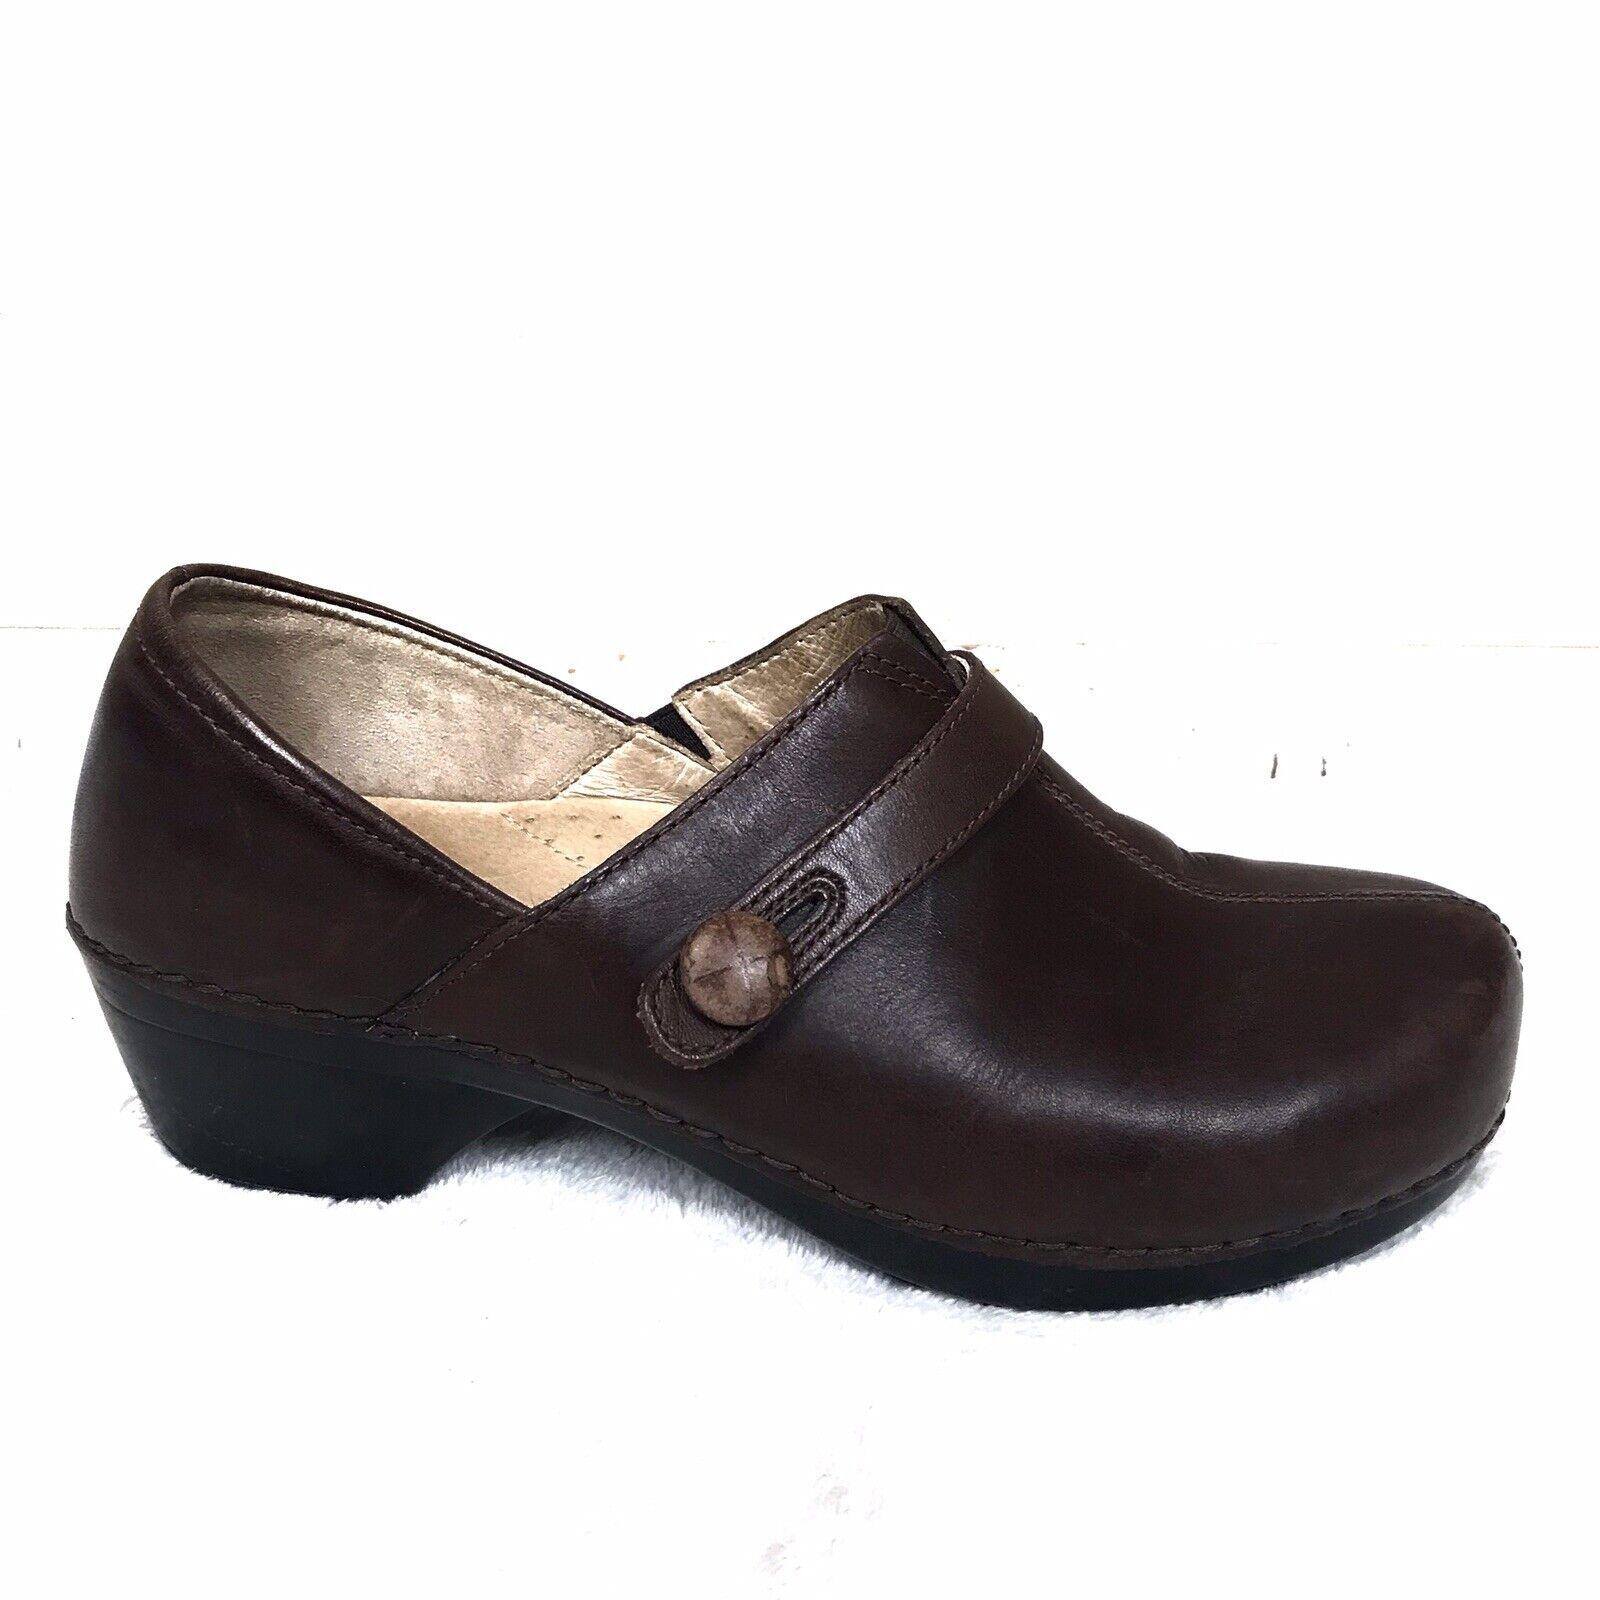 Dansko damen braun Solstice Leather Leather Leather Clogs Nursing Comfort 40 10 7edf9f